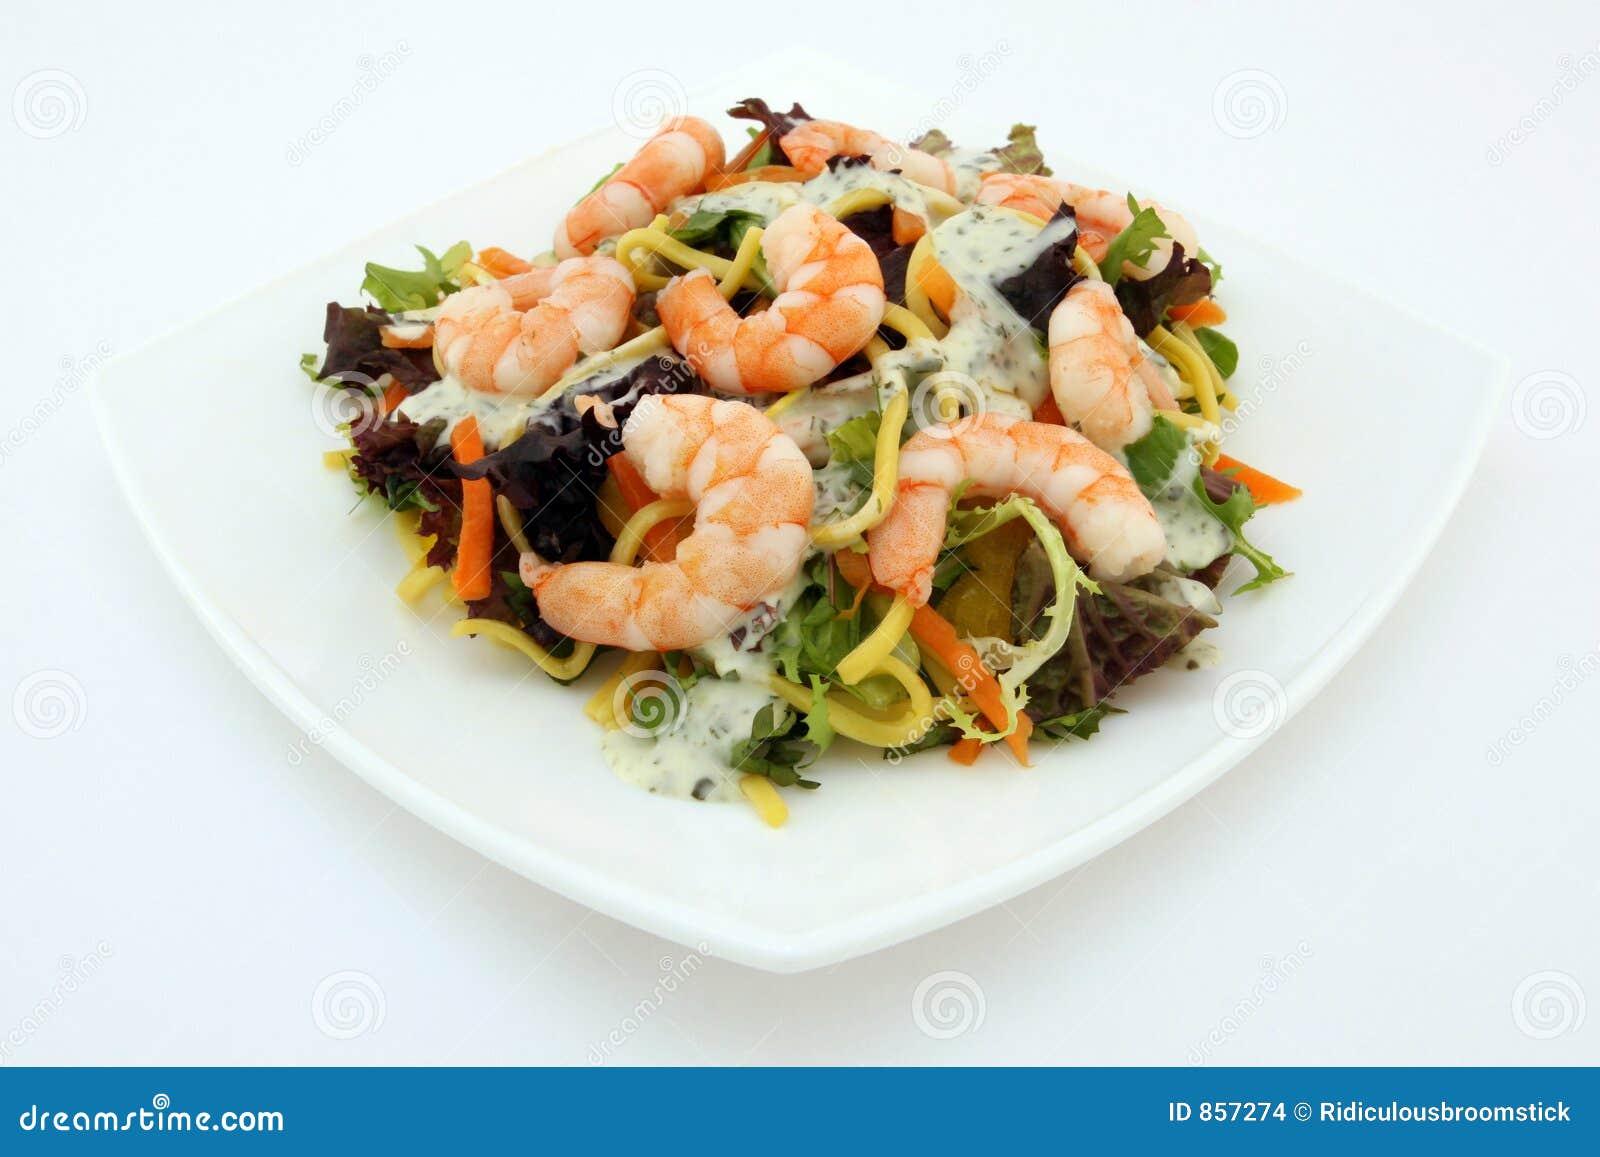 Healthy noodle and prawn diet salad starter